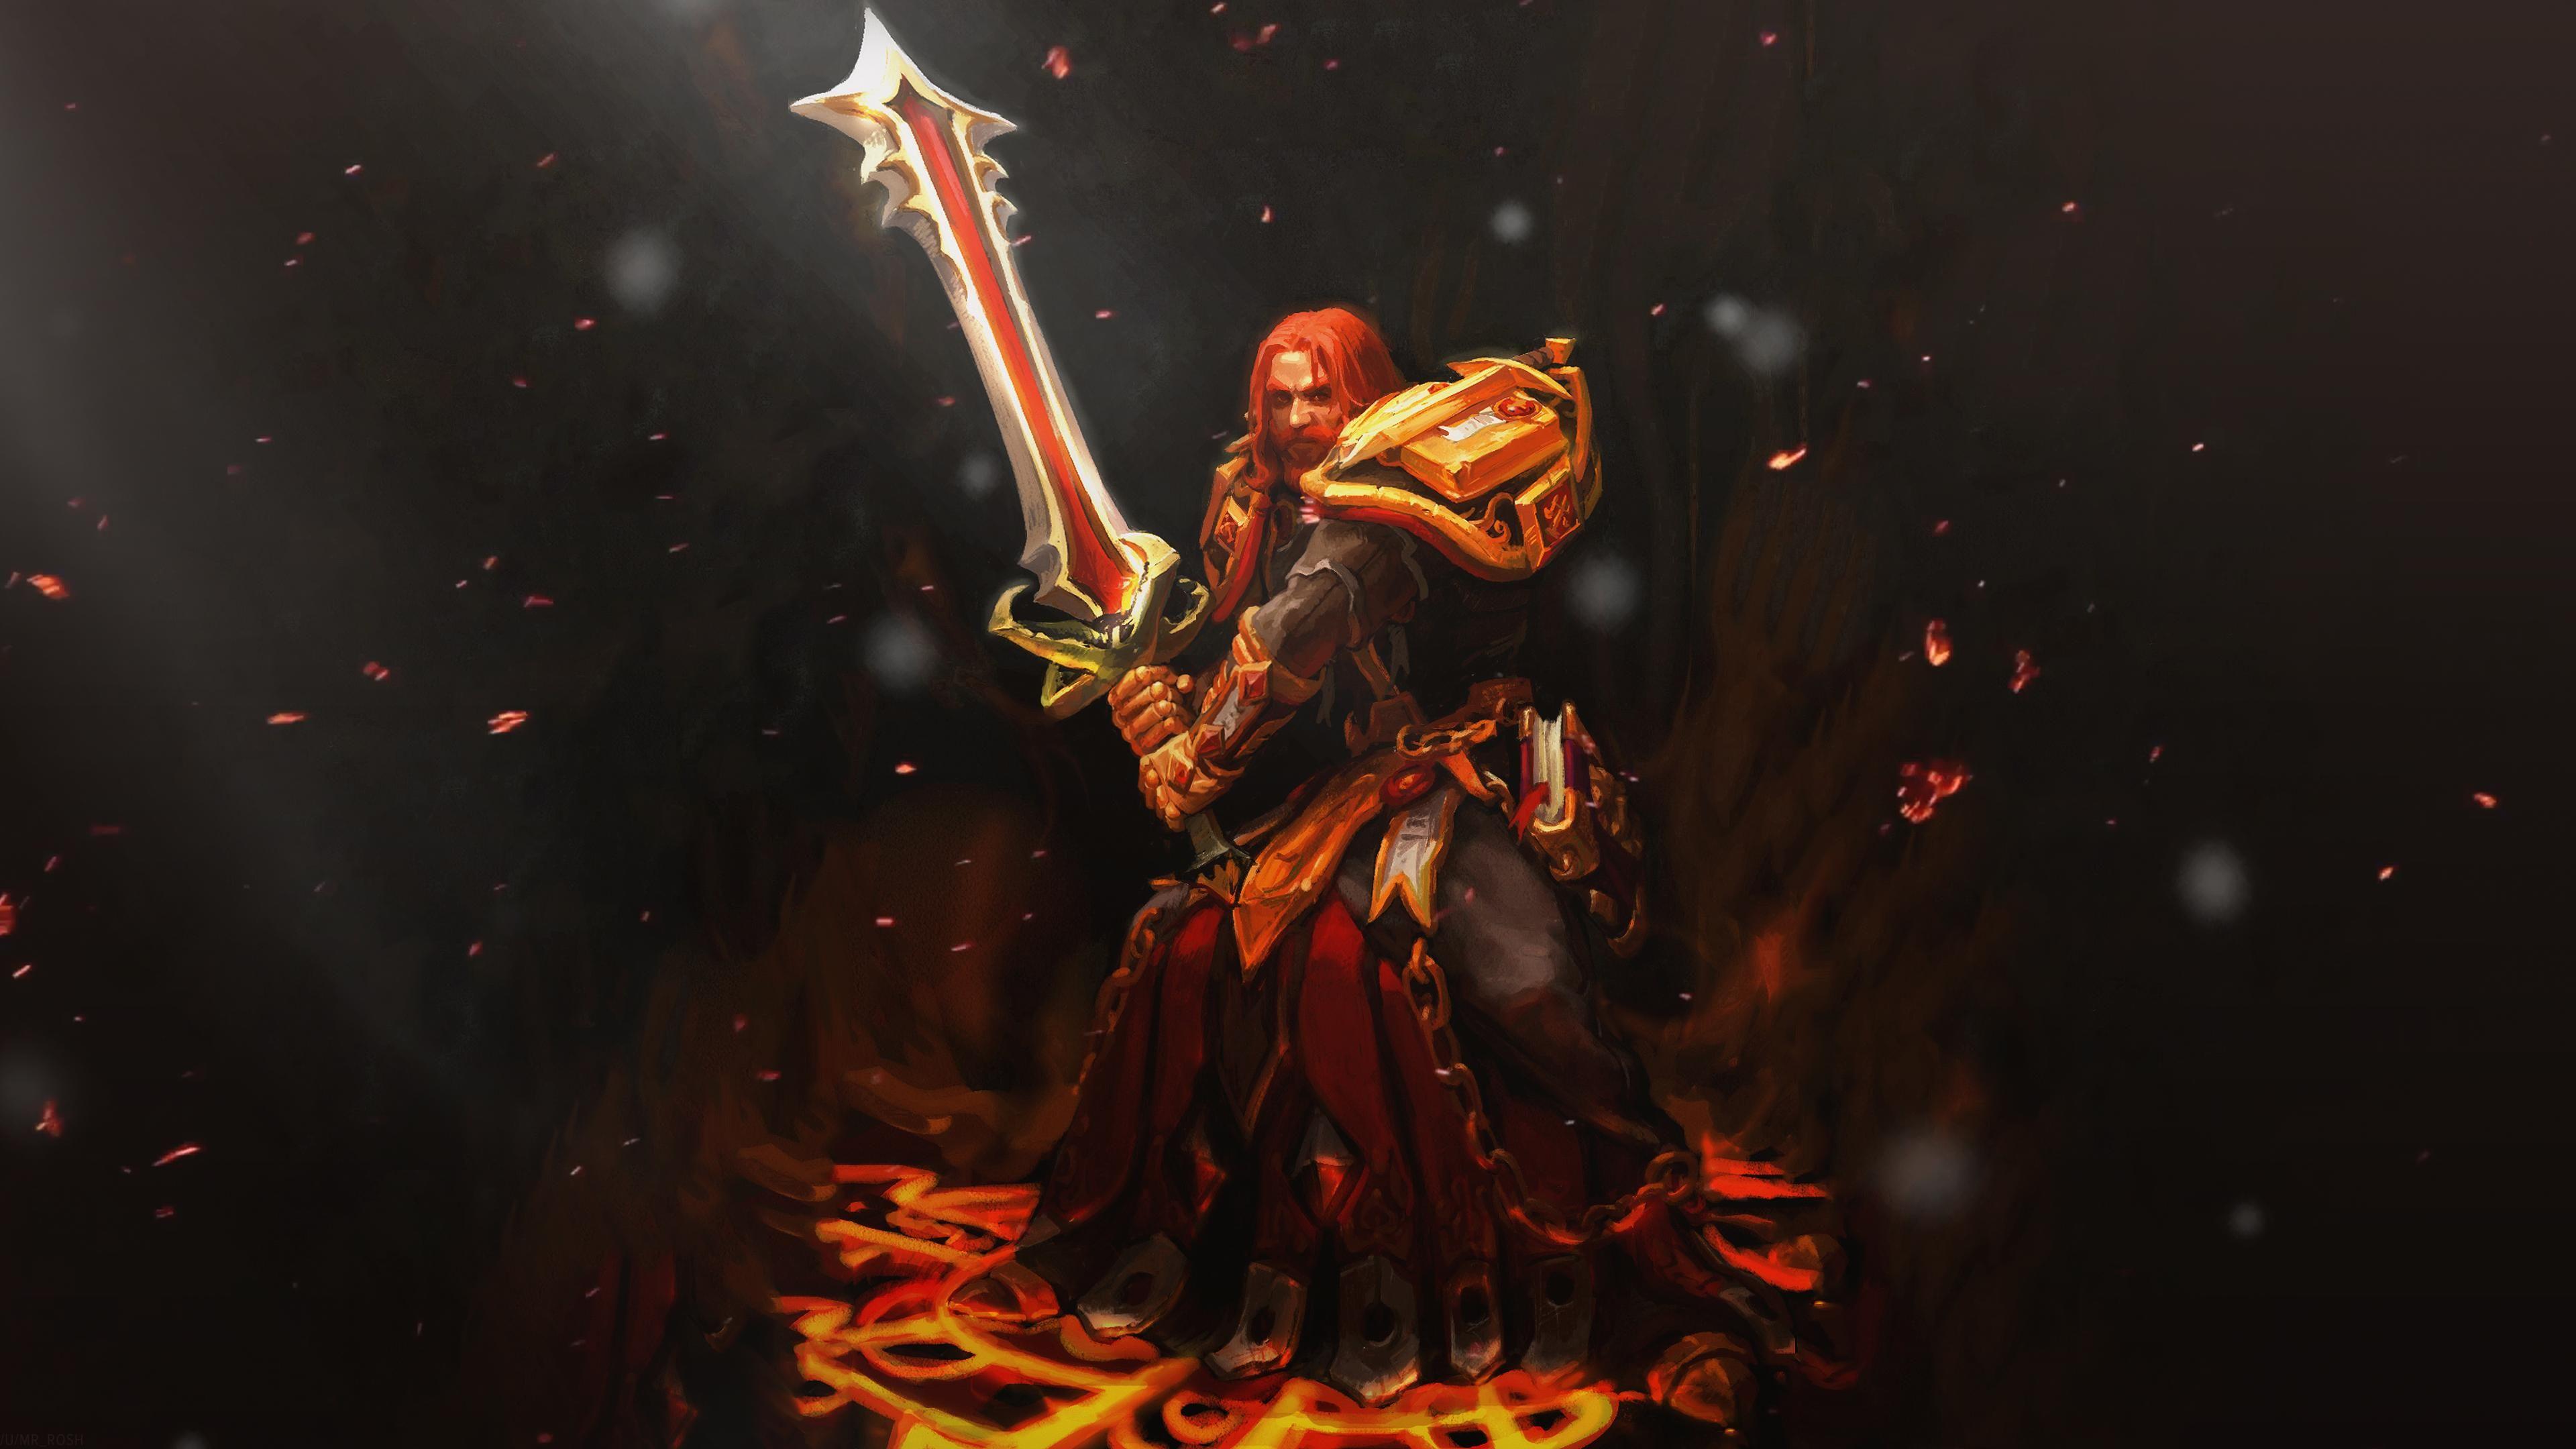 Retribution Paladin 4k Wallpaper Collection Album On Imgur Paladin Wallpaper World Of Warcraft